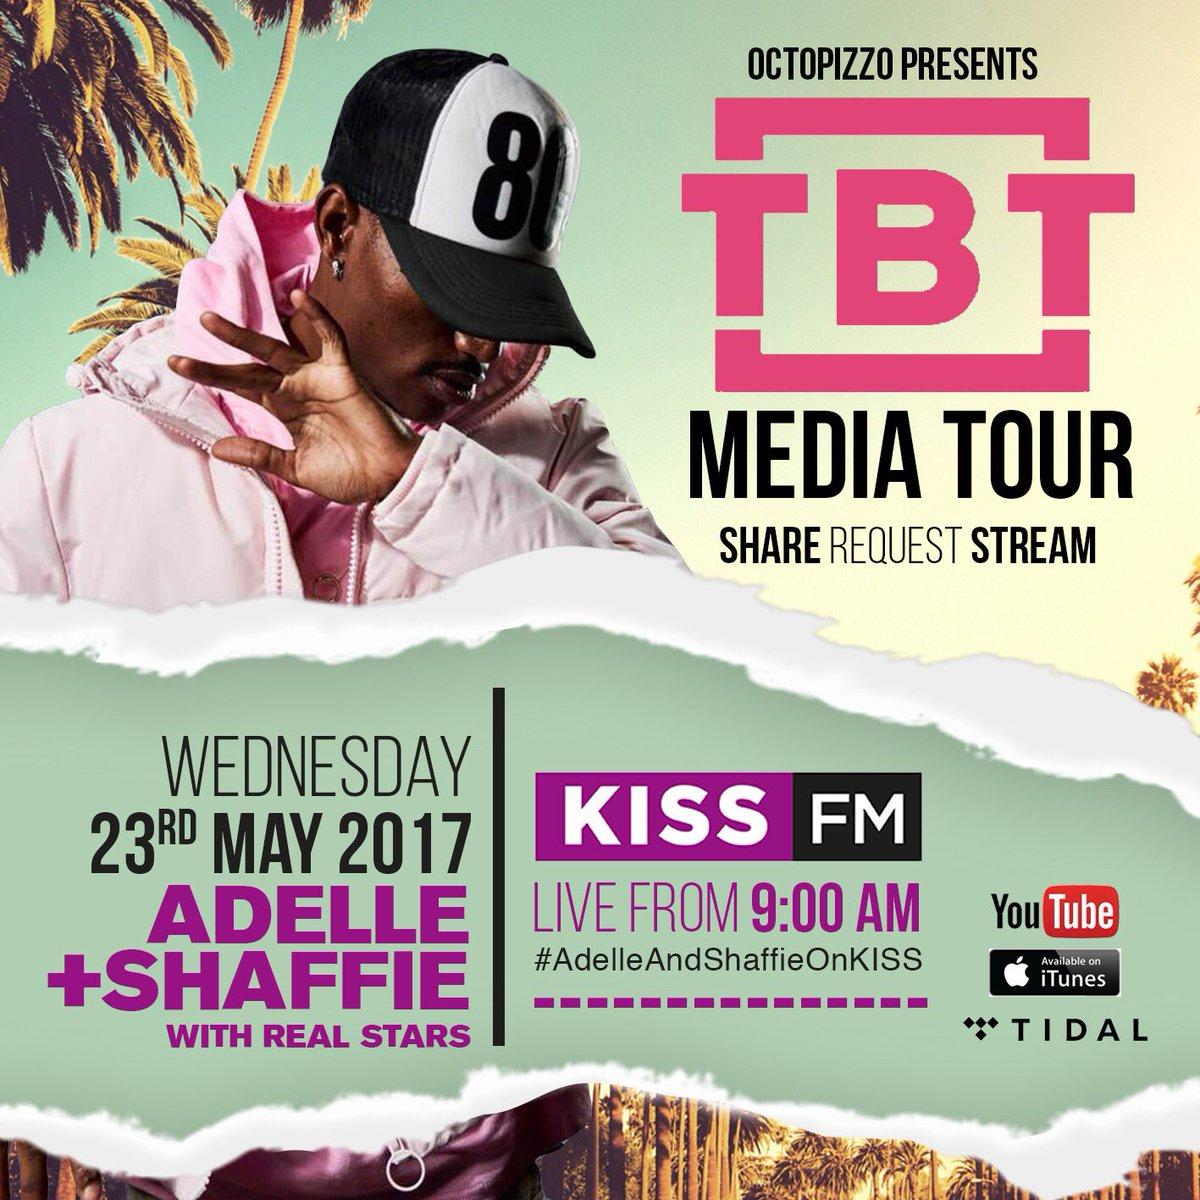 Tomorrow 9am catch me live on @Kiss100kenya with @ADELLEO &amp; @ShaffieWeru  #TBT  https:// youtu.be/X3vvoh6OFXI  &nbsp;  <br>http://pic.twitter.com/c9sbjul6hp